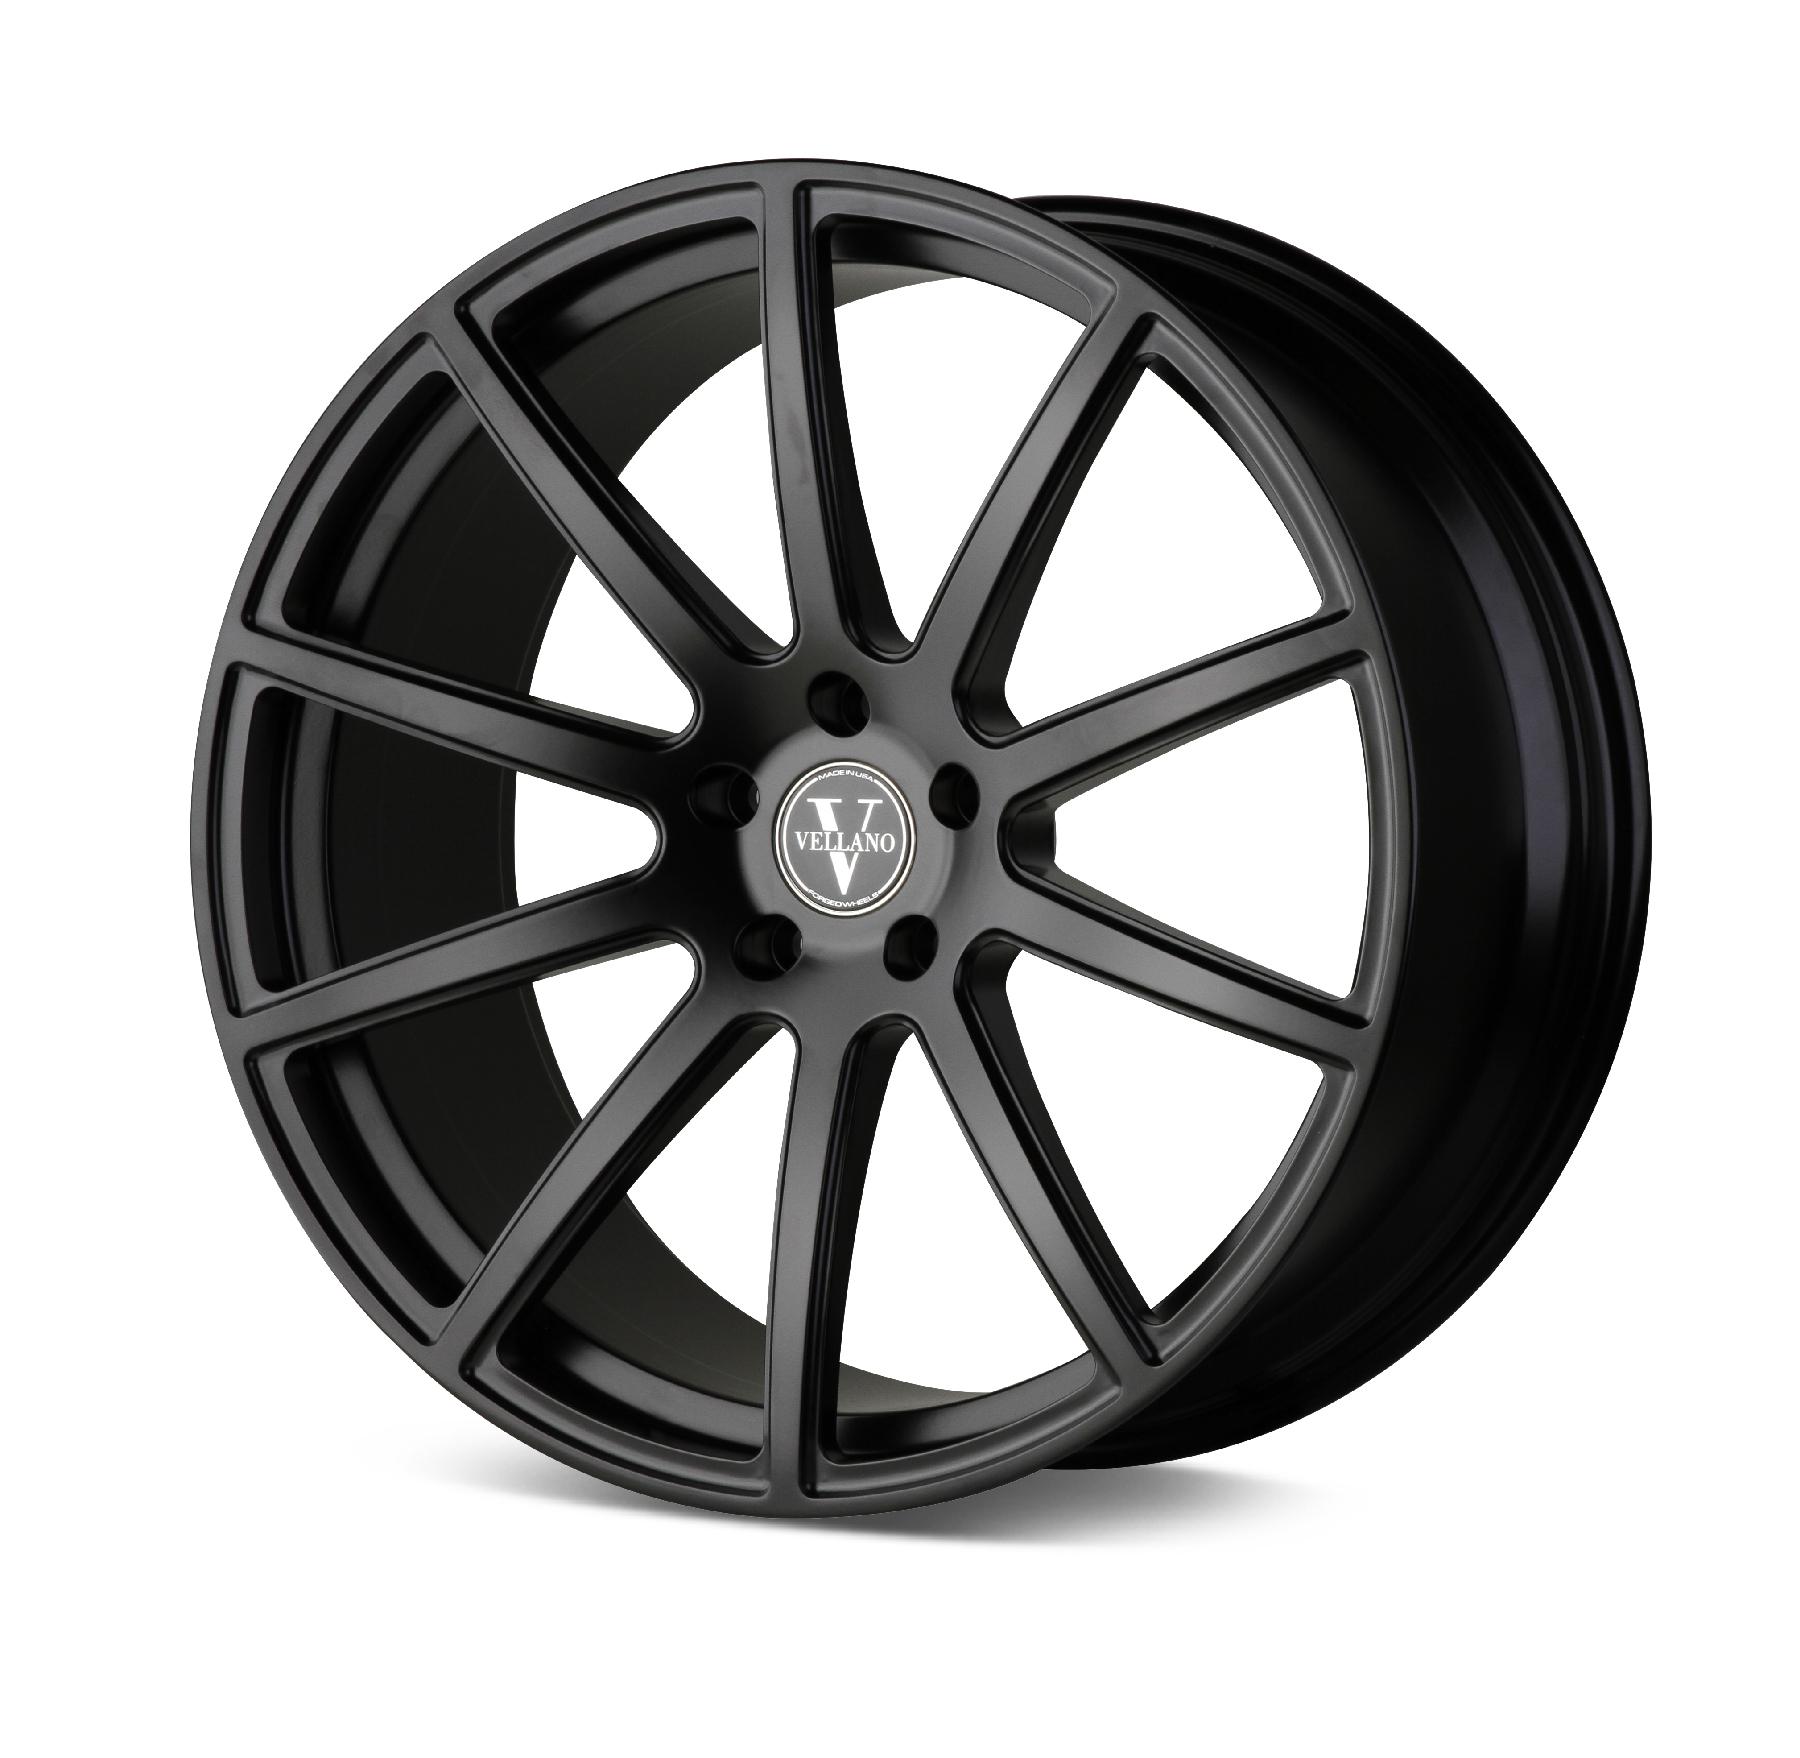 Vellano VM02 forged wheels